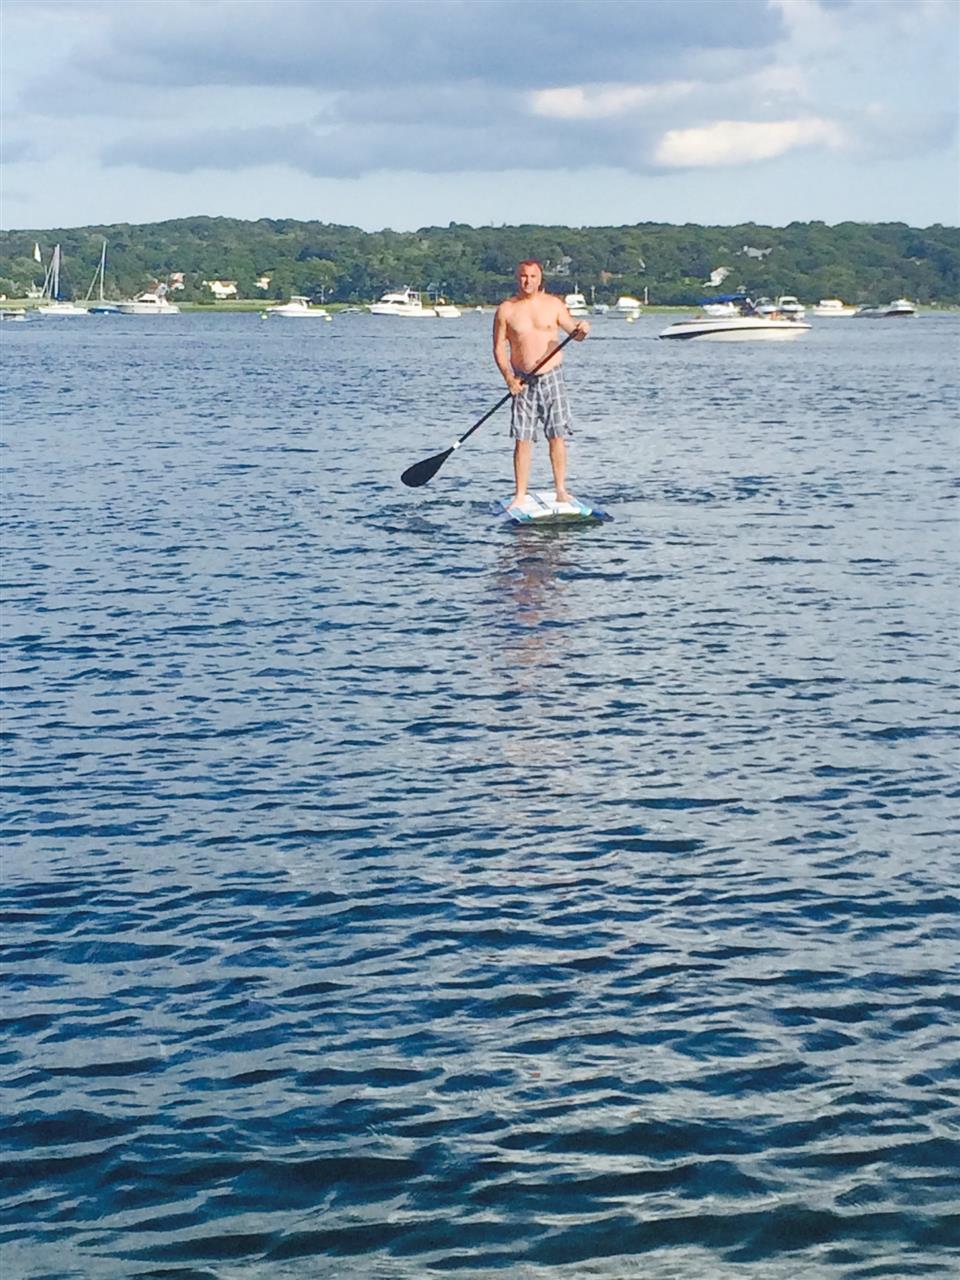 #SouthShore #LongIsland #PaddleBoarding #Fun #SummerTime #LeadingReLocal